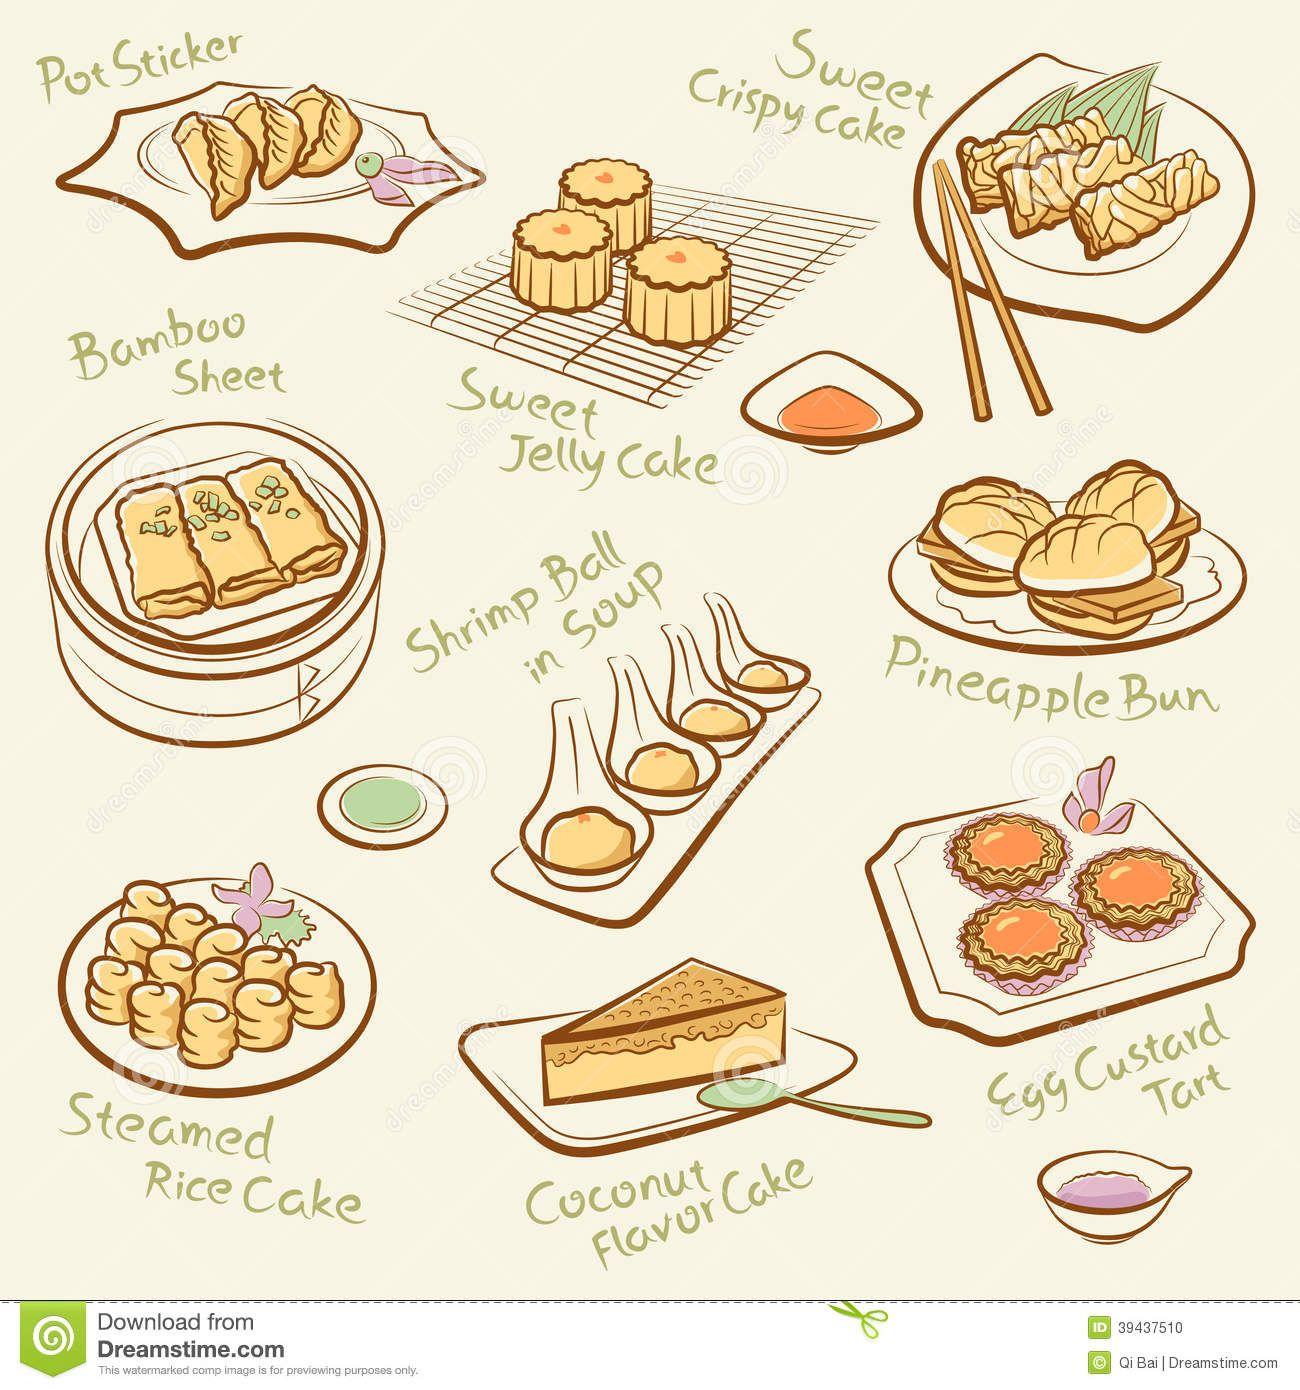 Weird Food Drawing 8